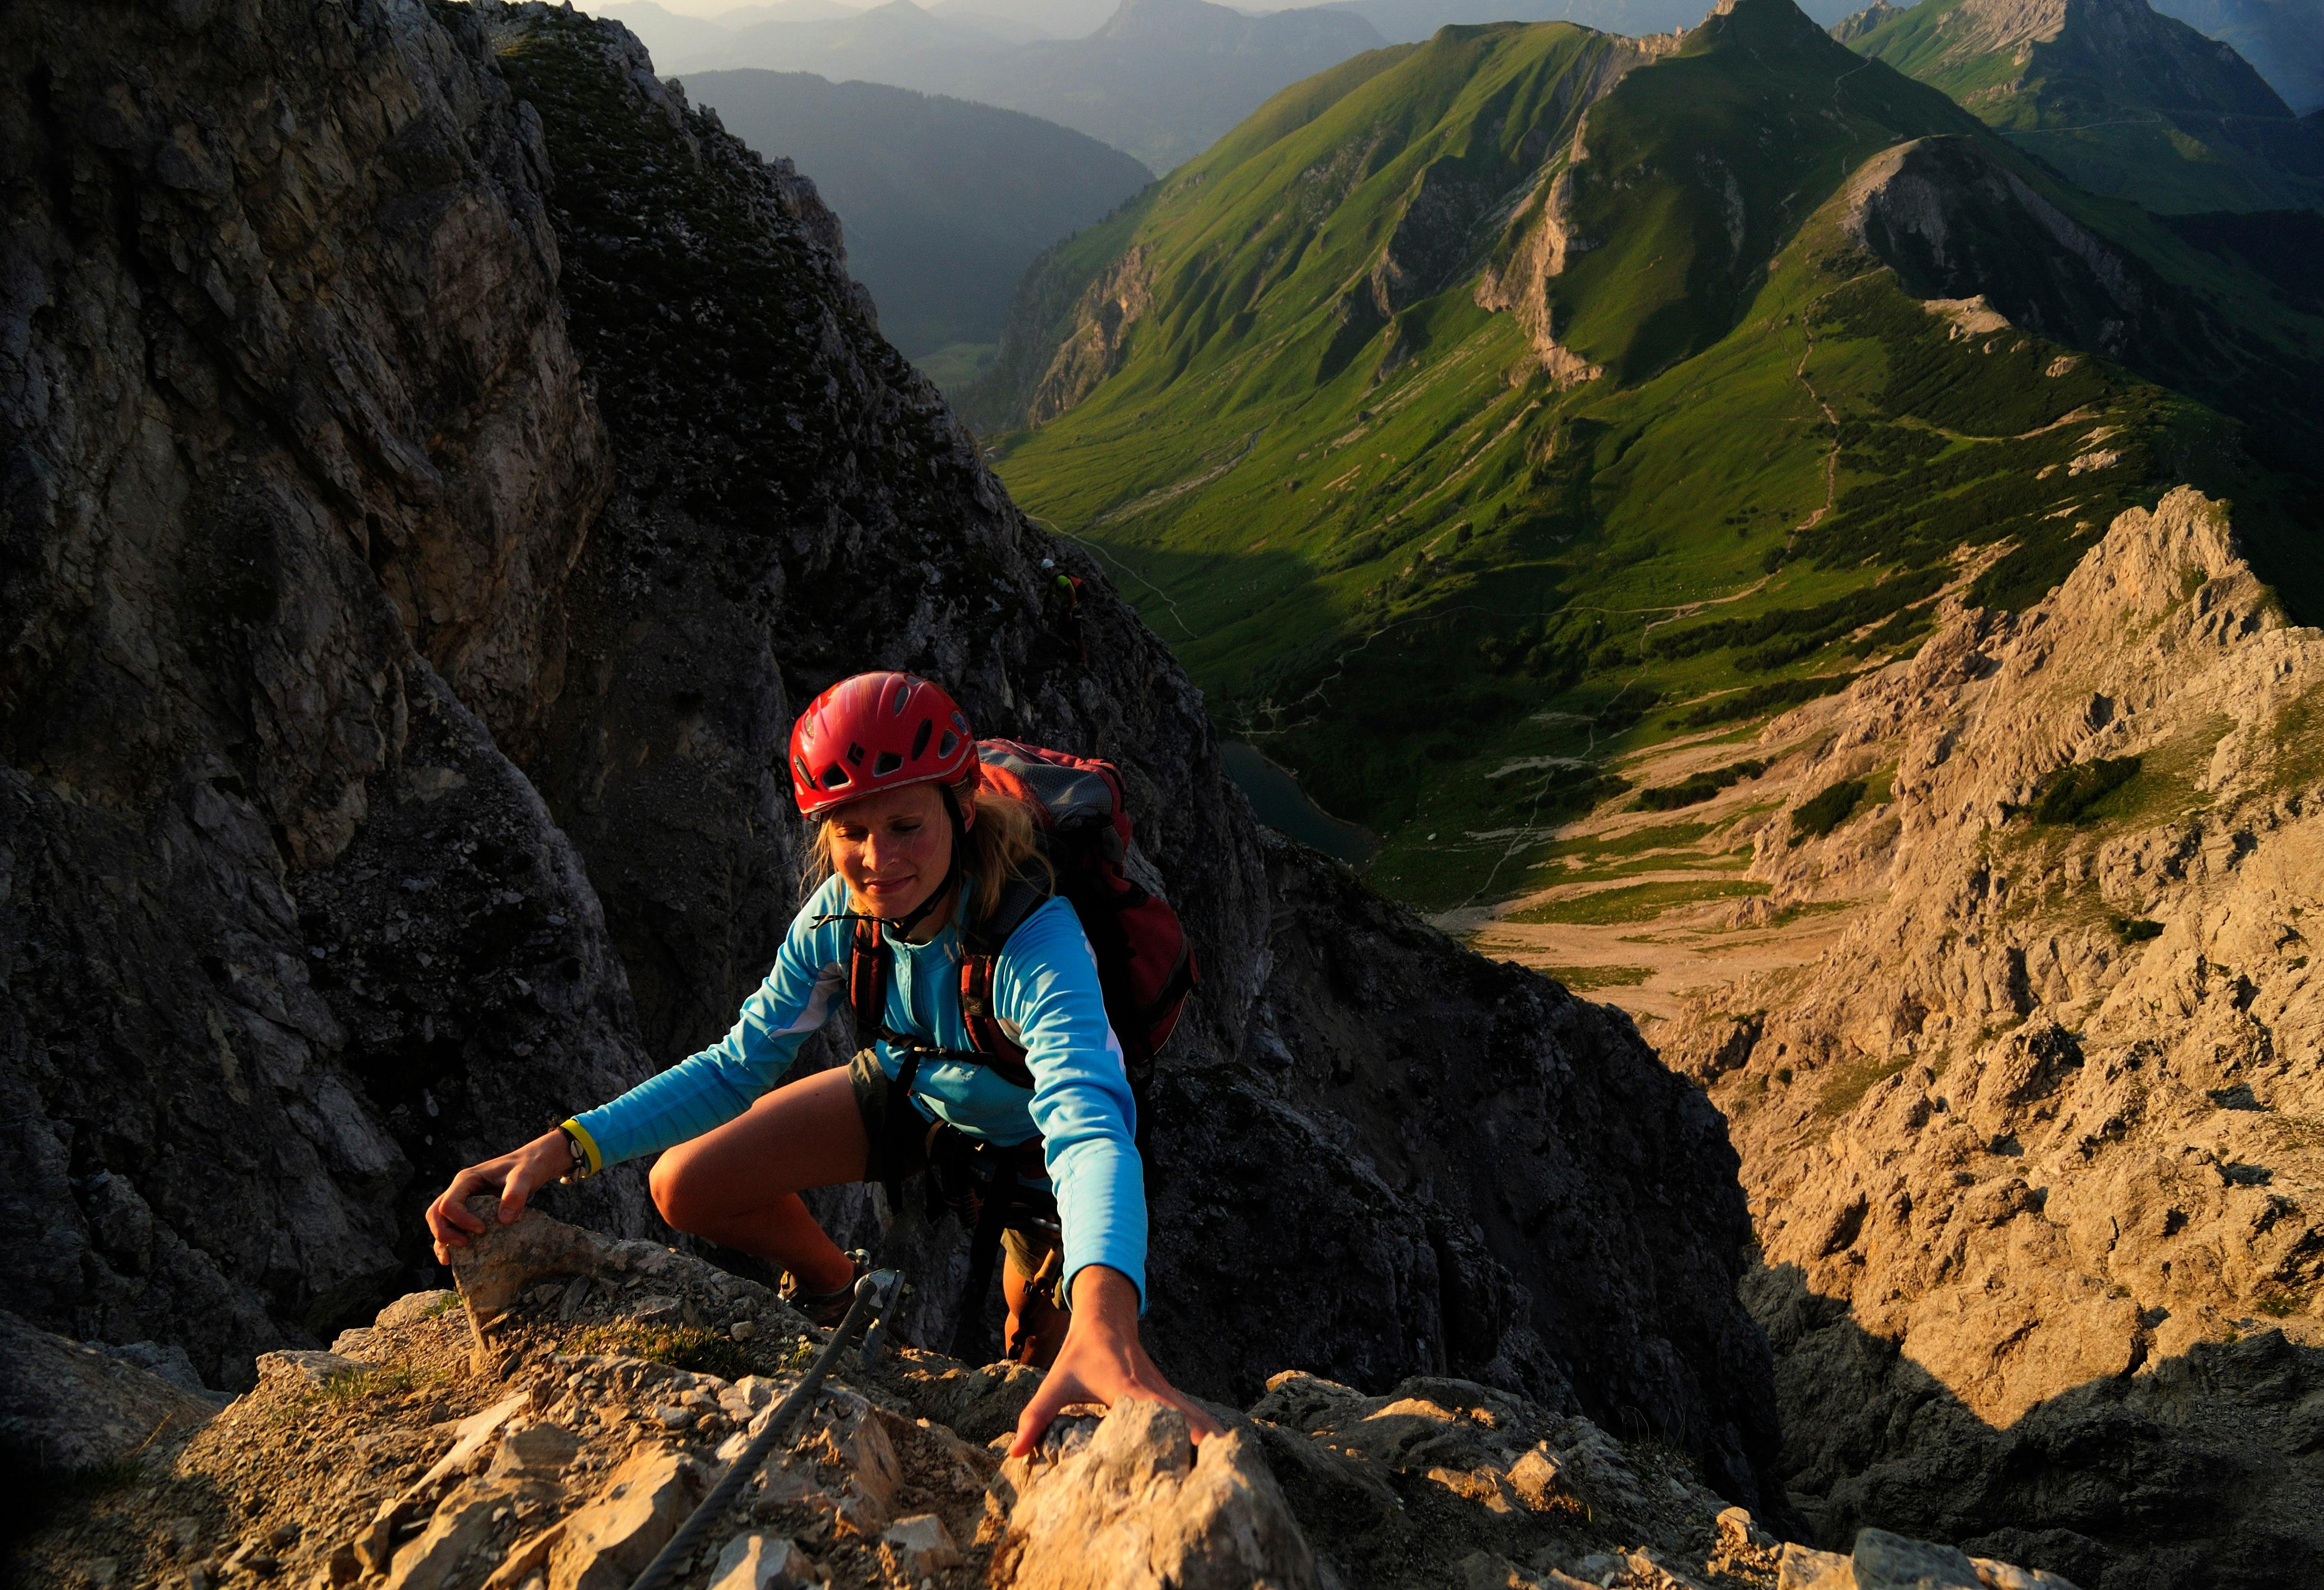 Klettersteig Tannheimer Tal : Klettersteige lachenspitze nordwand km bergwelten